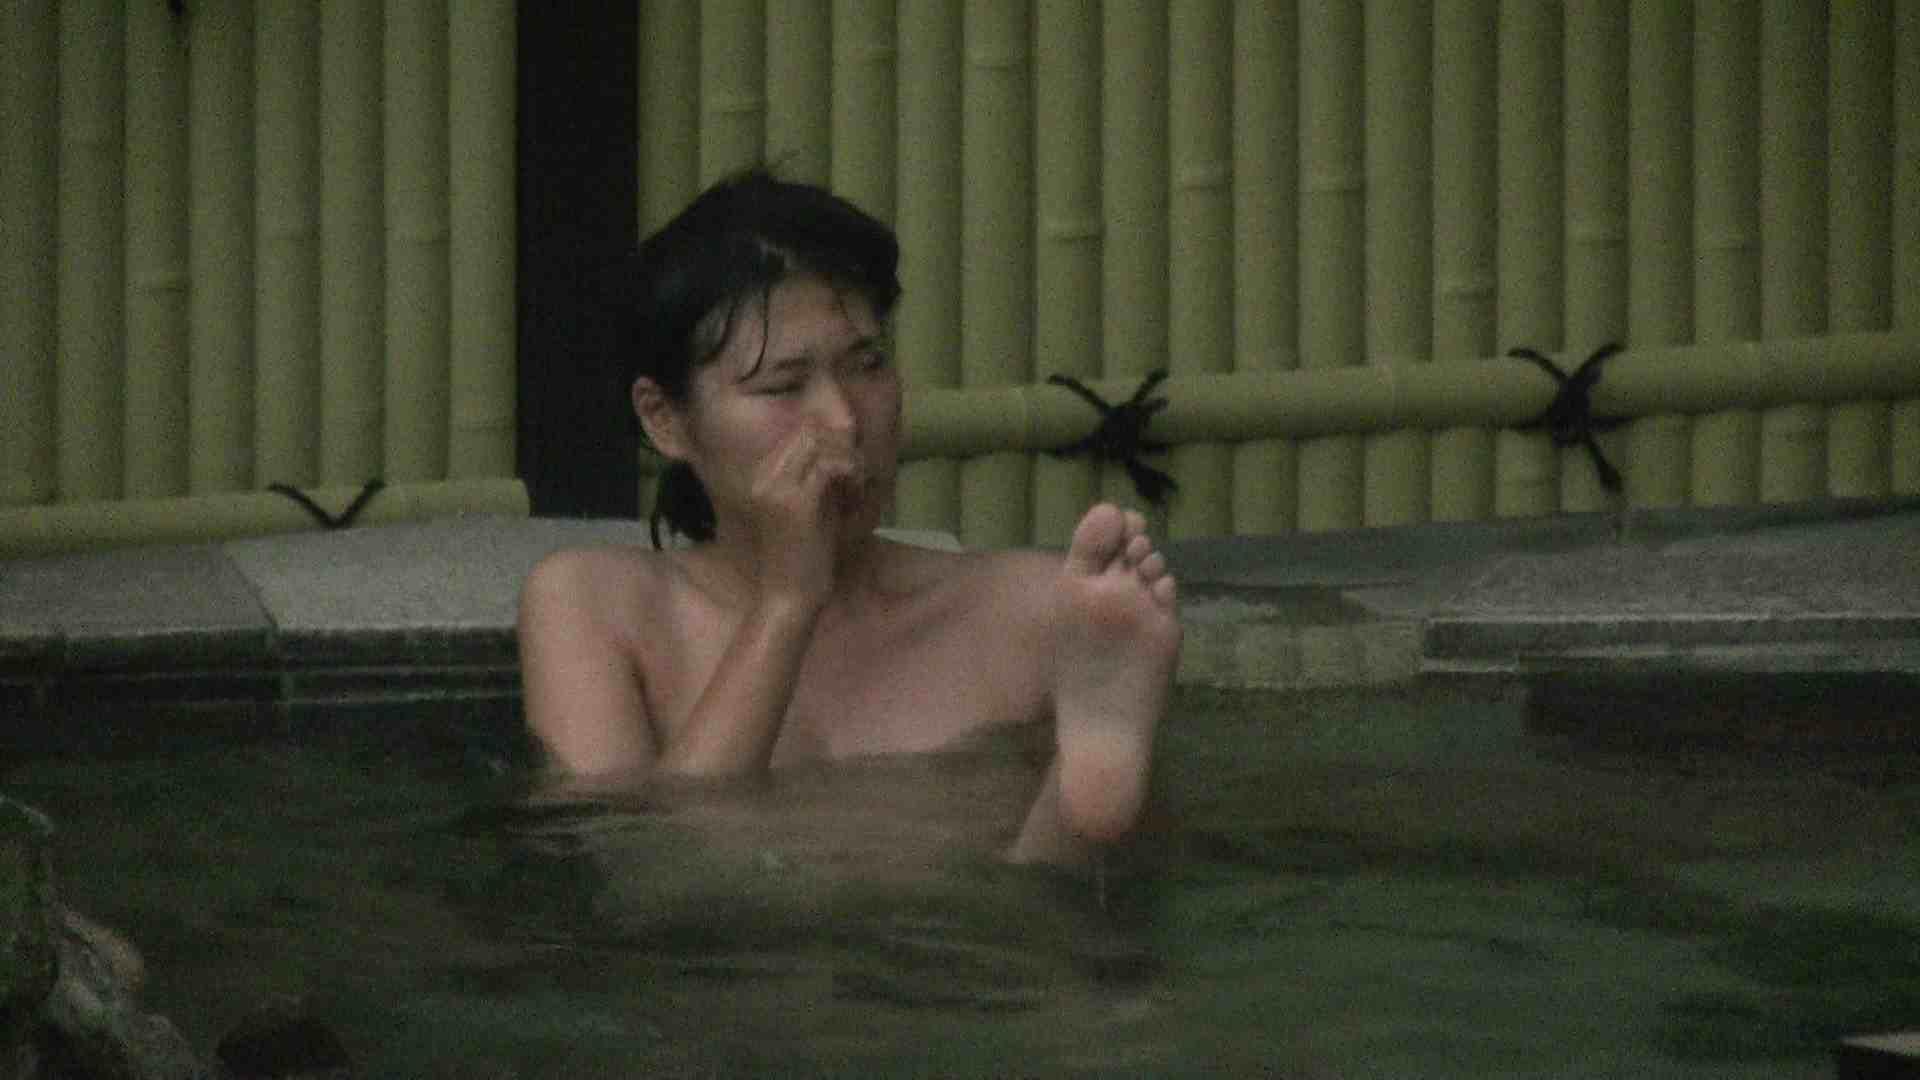 Aquaな露天風呂Vol.215 綺麗なOLたち  106枚 42